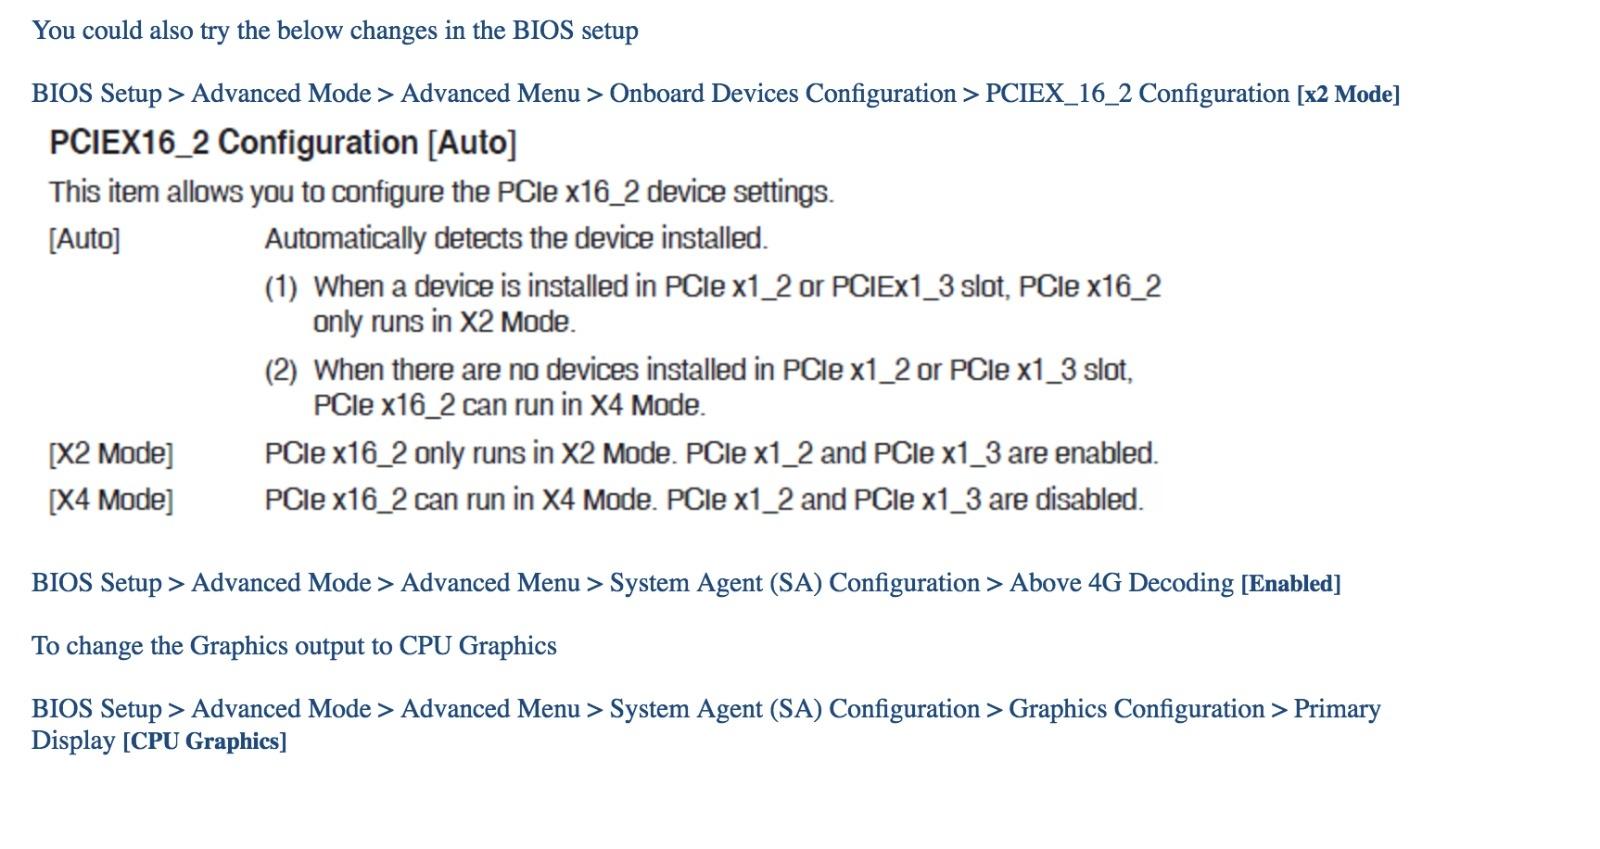 ROG STRIX B250F GAMING motherboard for Eth mining — Ethereum